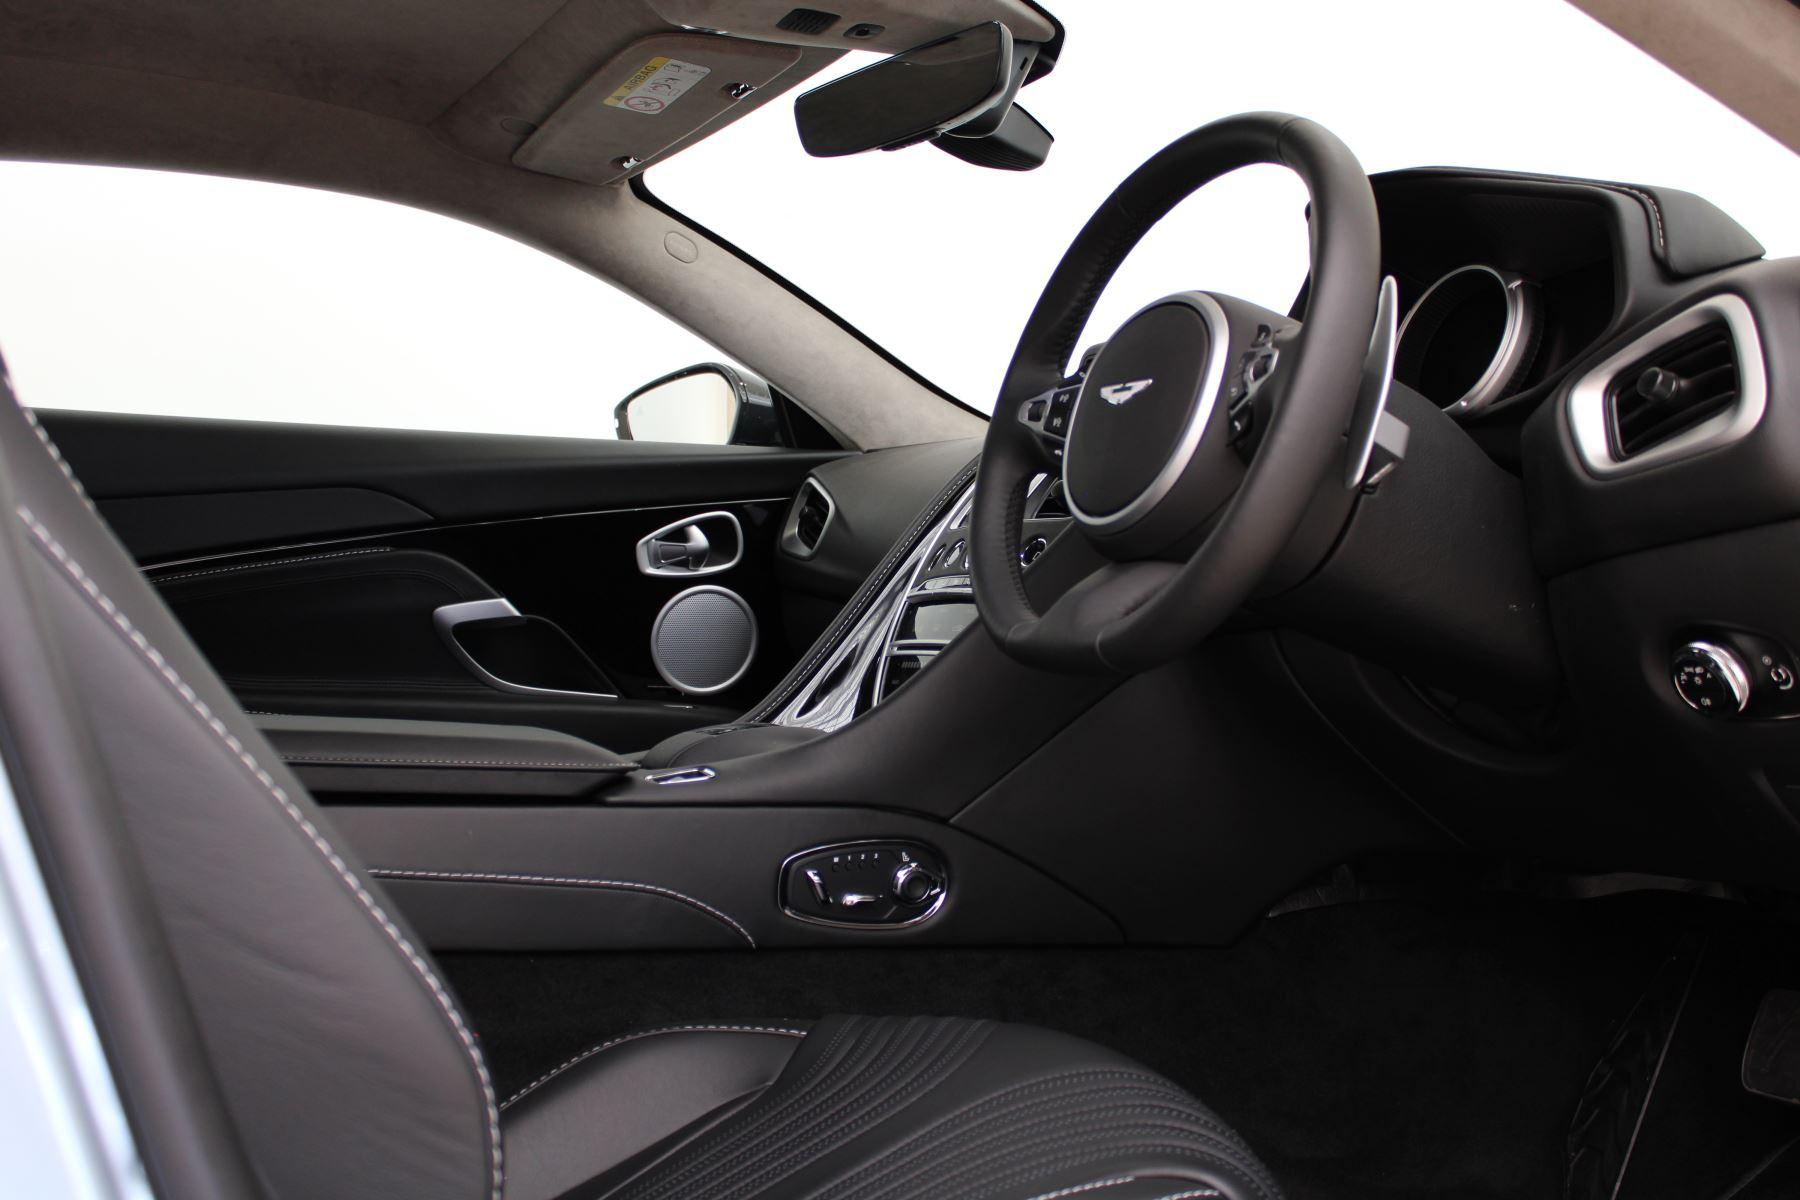 Aston Martin DB11 V8 2dr Touchtronic Auto image 13